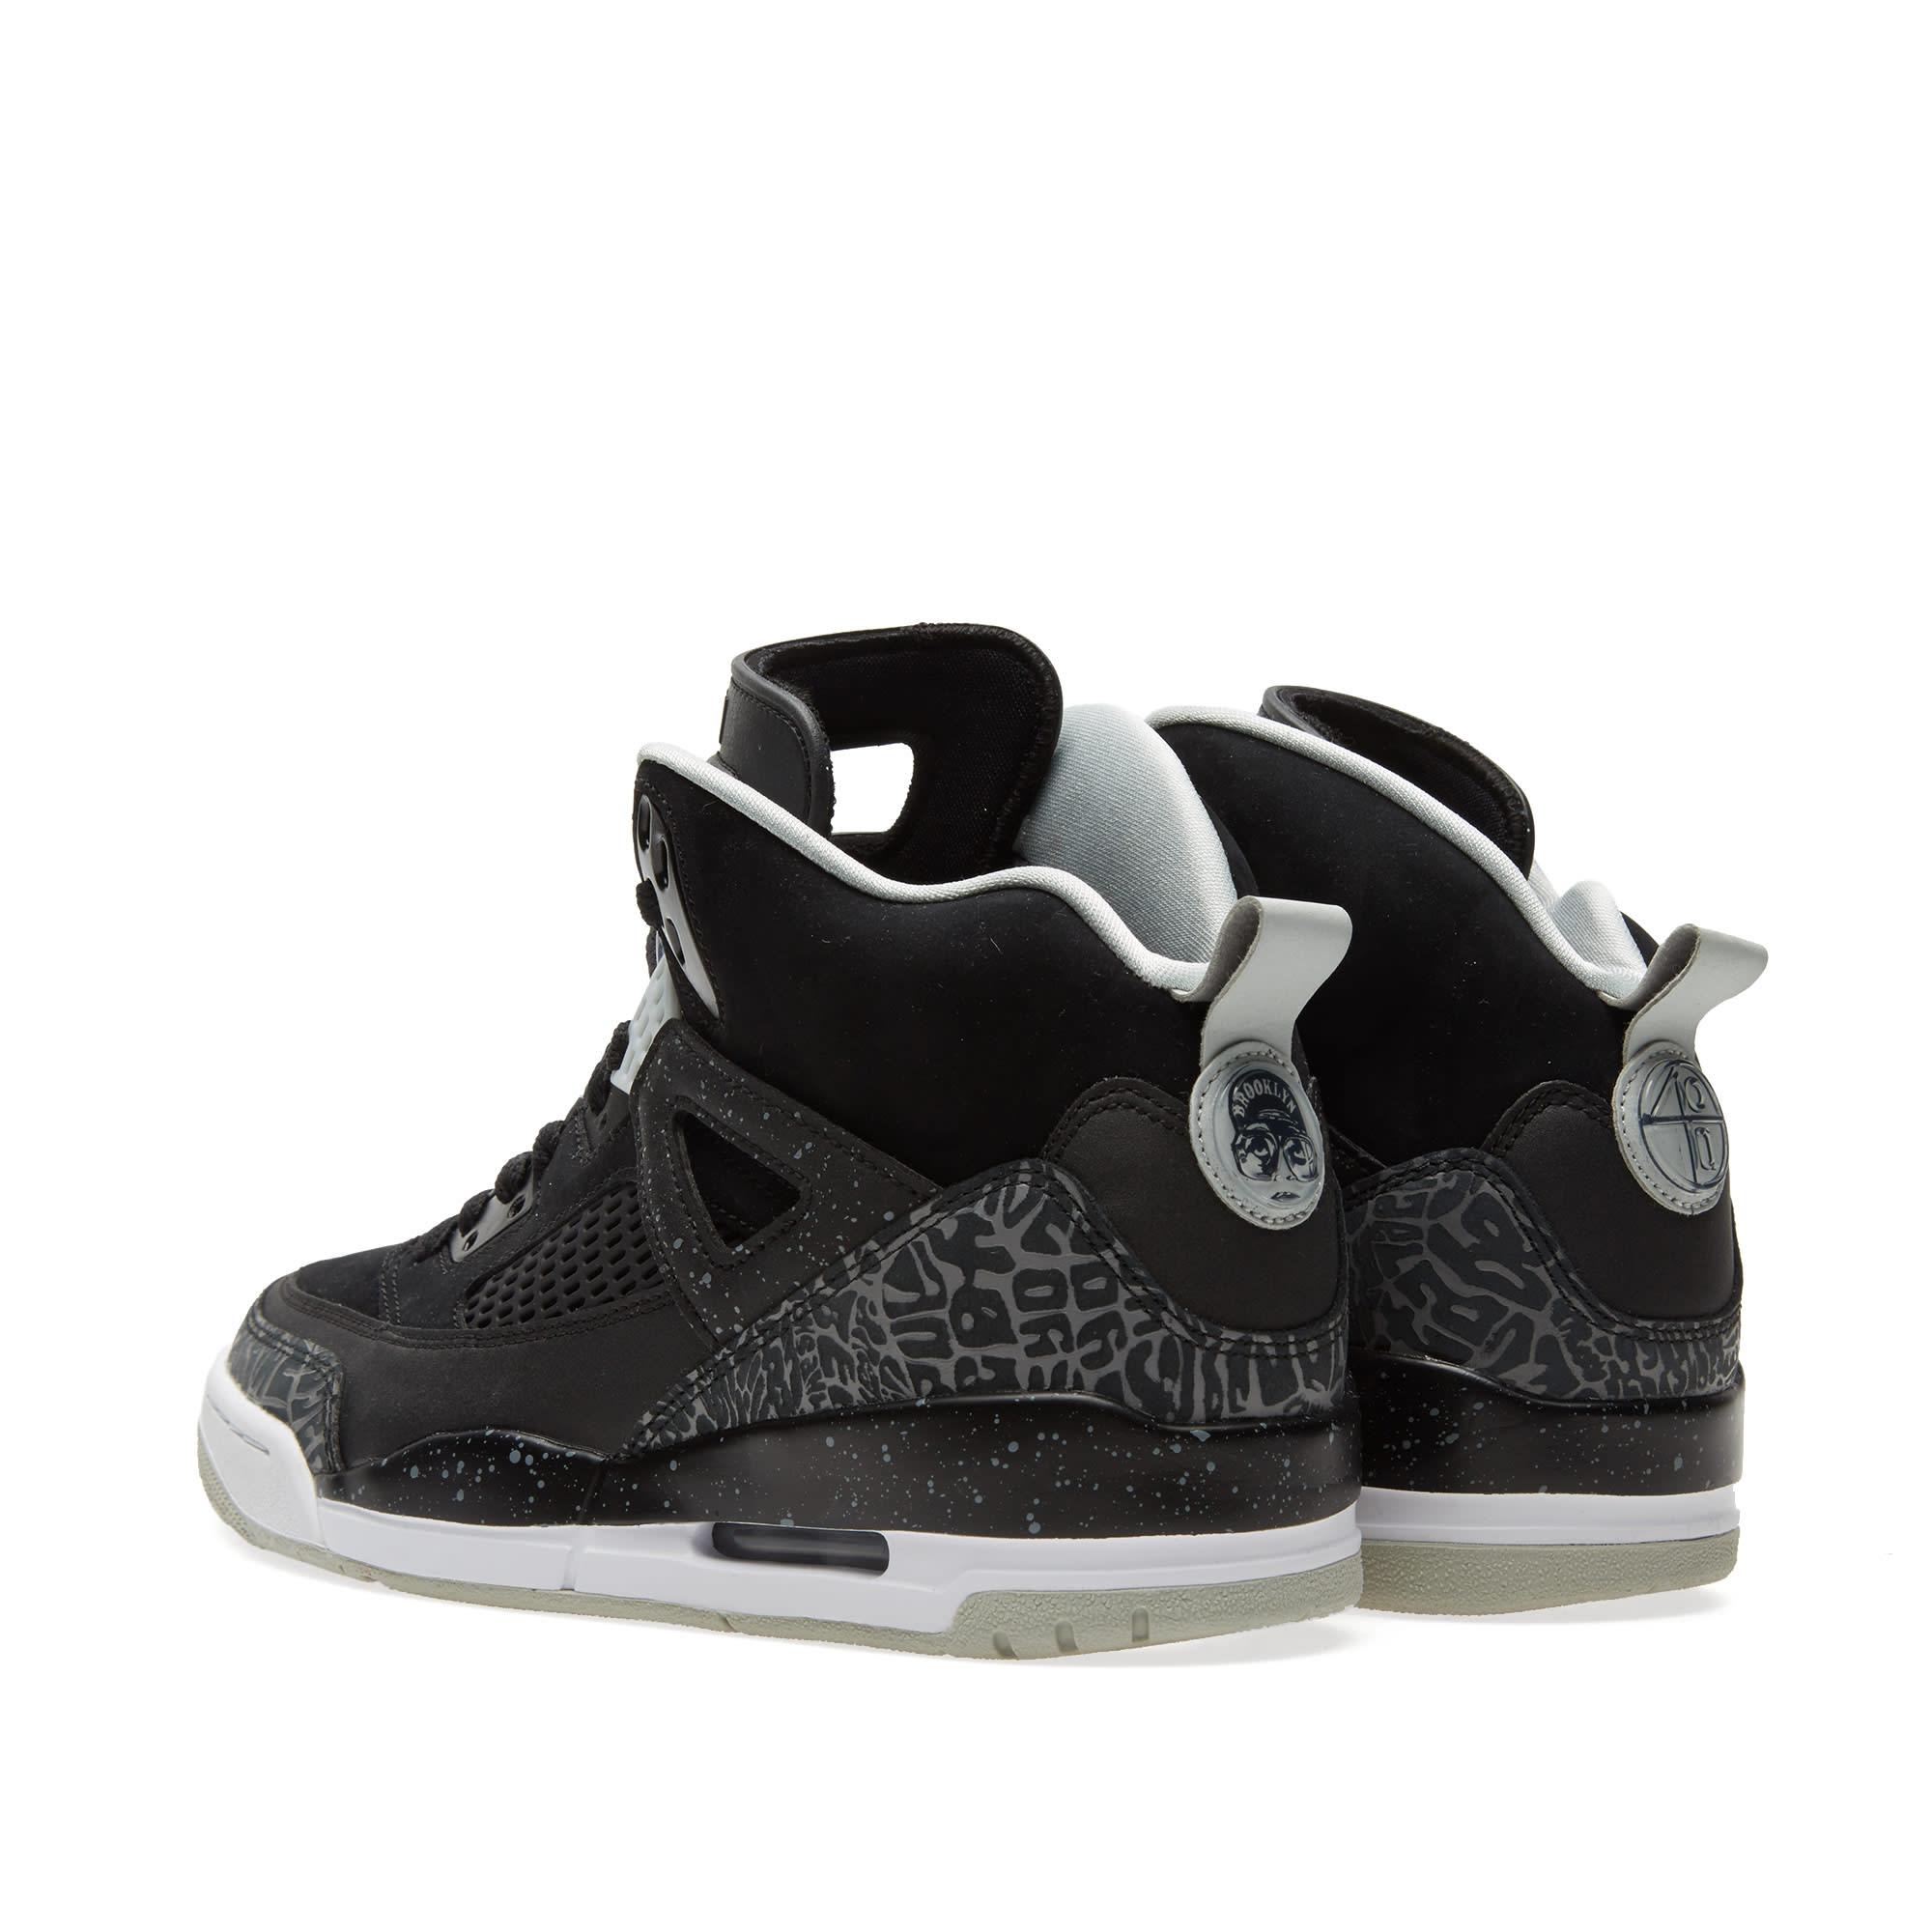 official photos 0b9c6 1f696 Nike Jordan Spizike 'Cool Grey' Black, Cool Grey & Grey Mist | END.